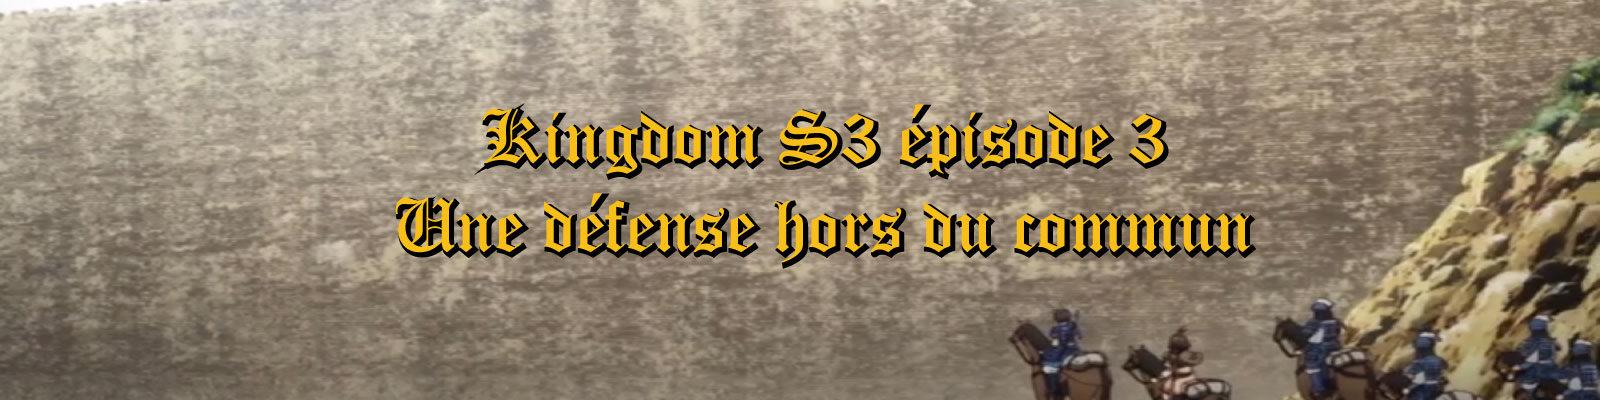 Kingdom-2-4